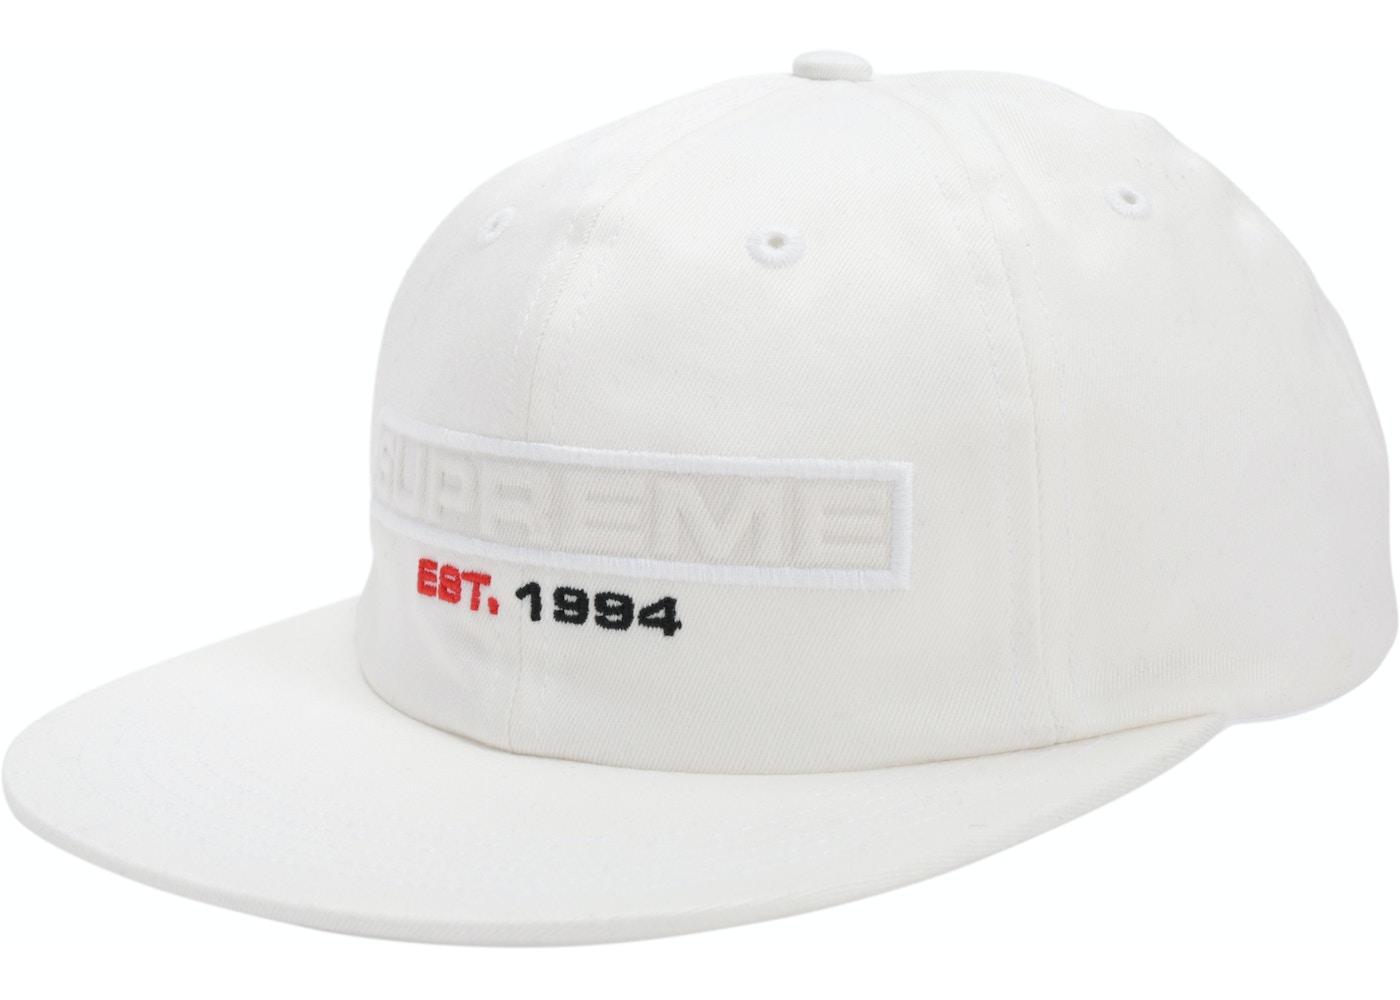 764d0758ed4 Streetwear - Supreme Headwear - Volatility